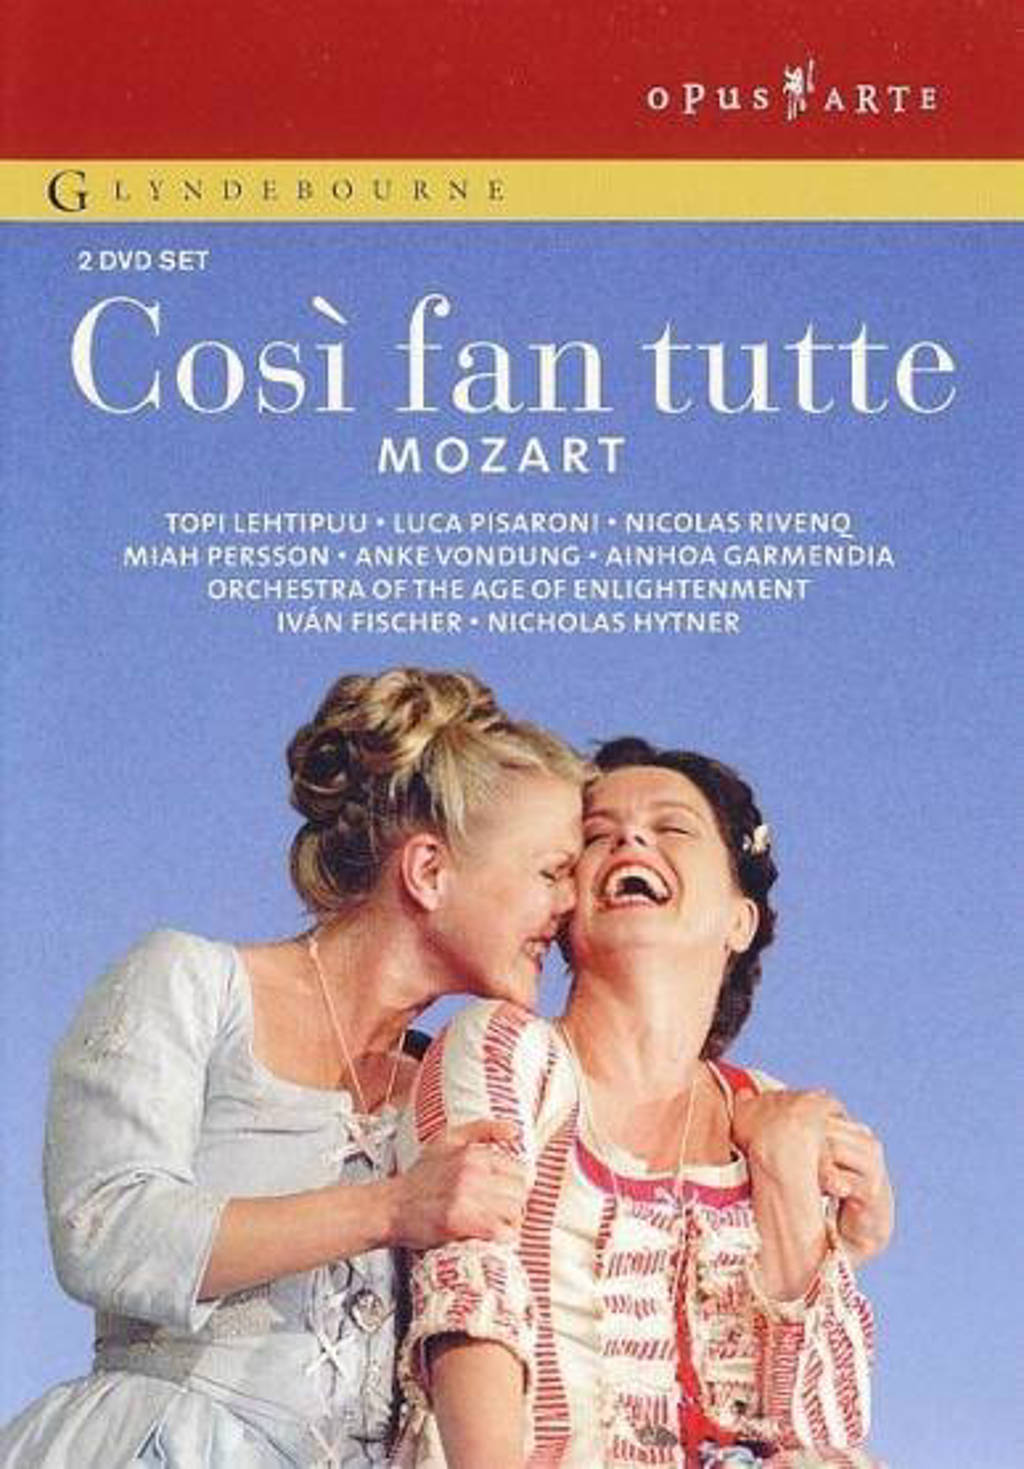 Lehtipuu/Pisaroni/Rivenq/Orchestra - Cosi Fan Tutte (DVD)